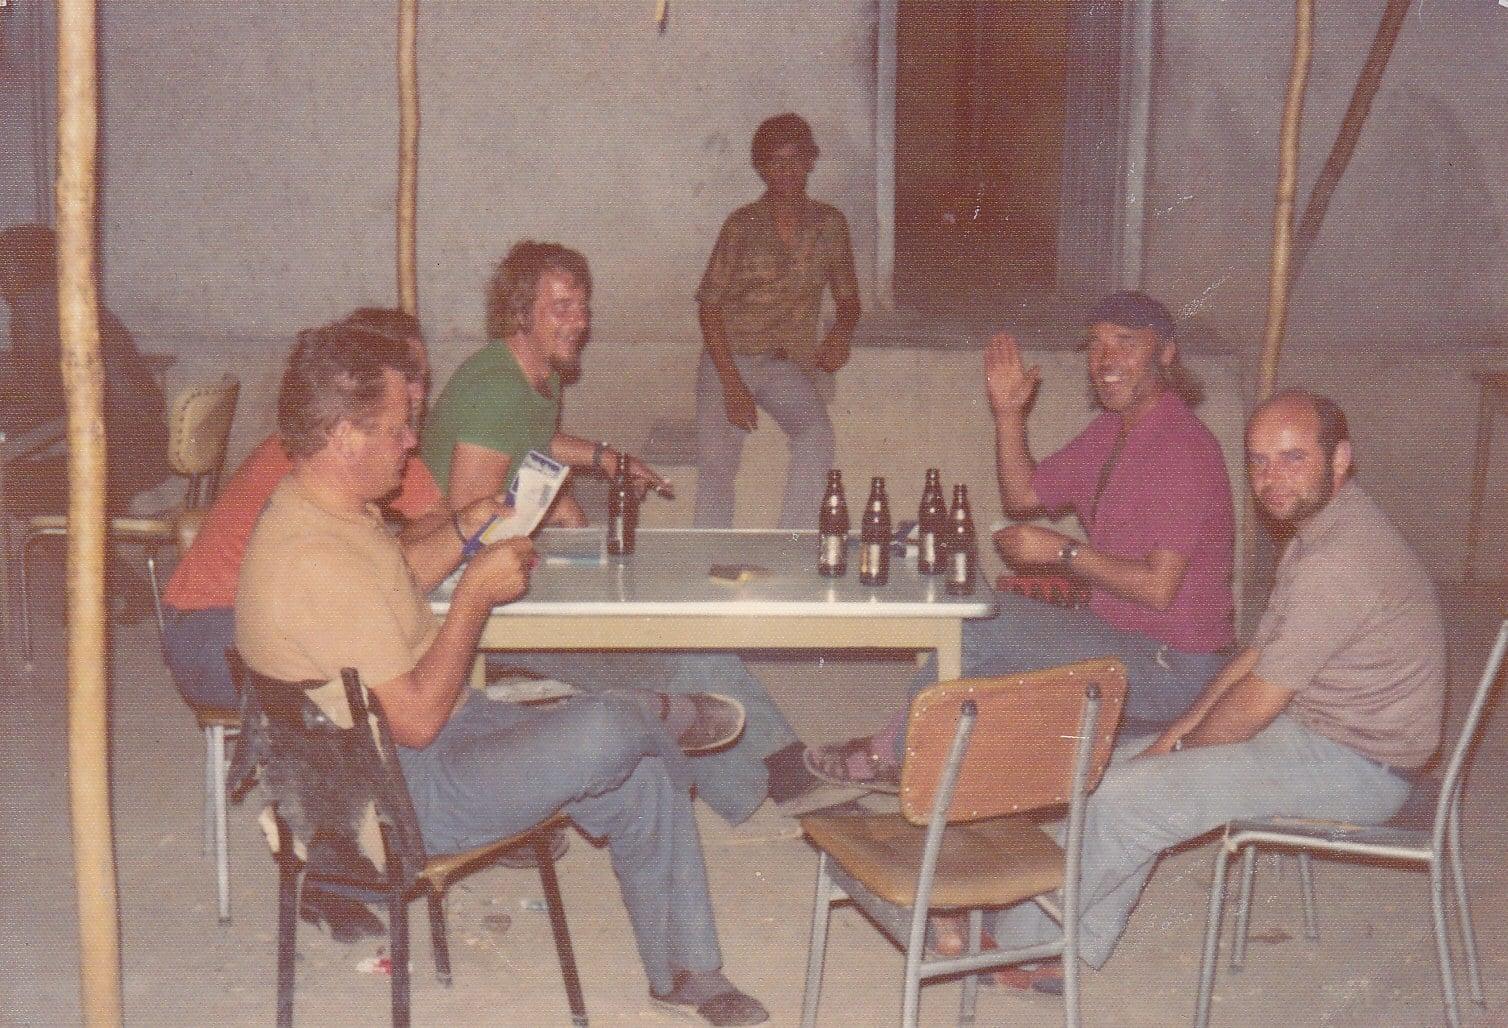 Dick-Pater--1975-ff-bakkie-doen-grens-Zahko-Turkije---Irak-